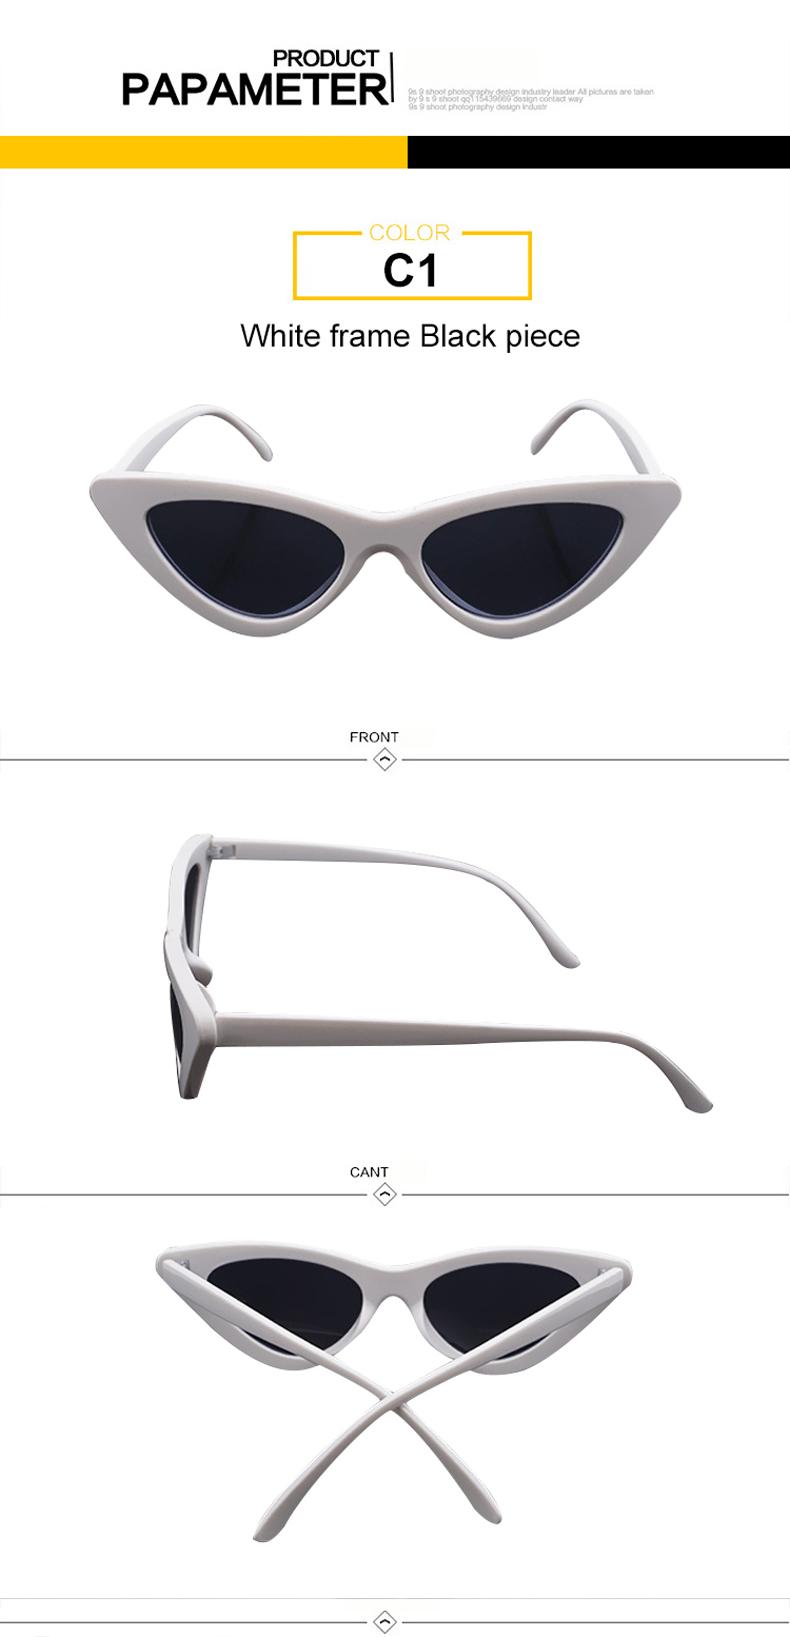 HTB1APP3iLBNTKJjSszeq6Au2VXaT - WHO CUTIE 2018 Brand Designer Black Cat Eye Sunglasses Women Cool Small Cateye Frame Sun Glasses Fashion UV400 Shades WG-008